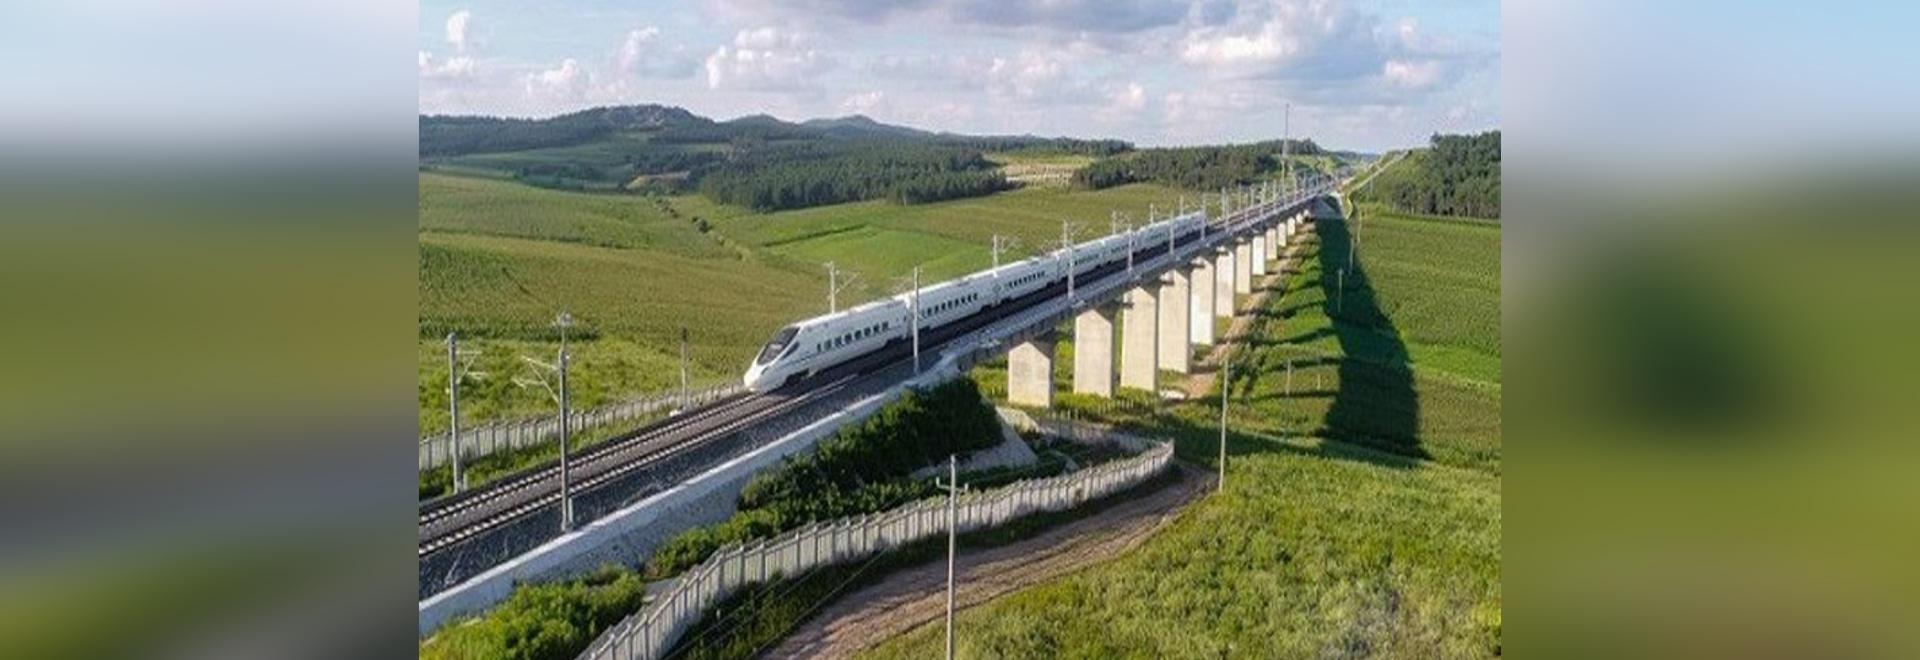 The longest express railway in China's alpine region has opened